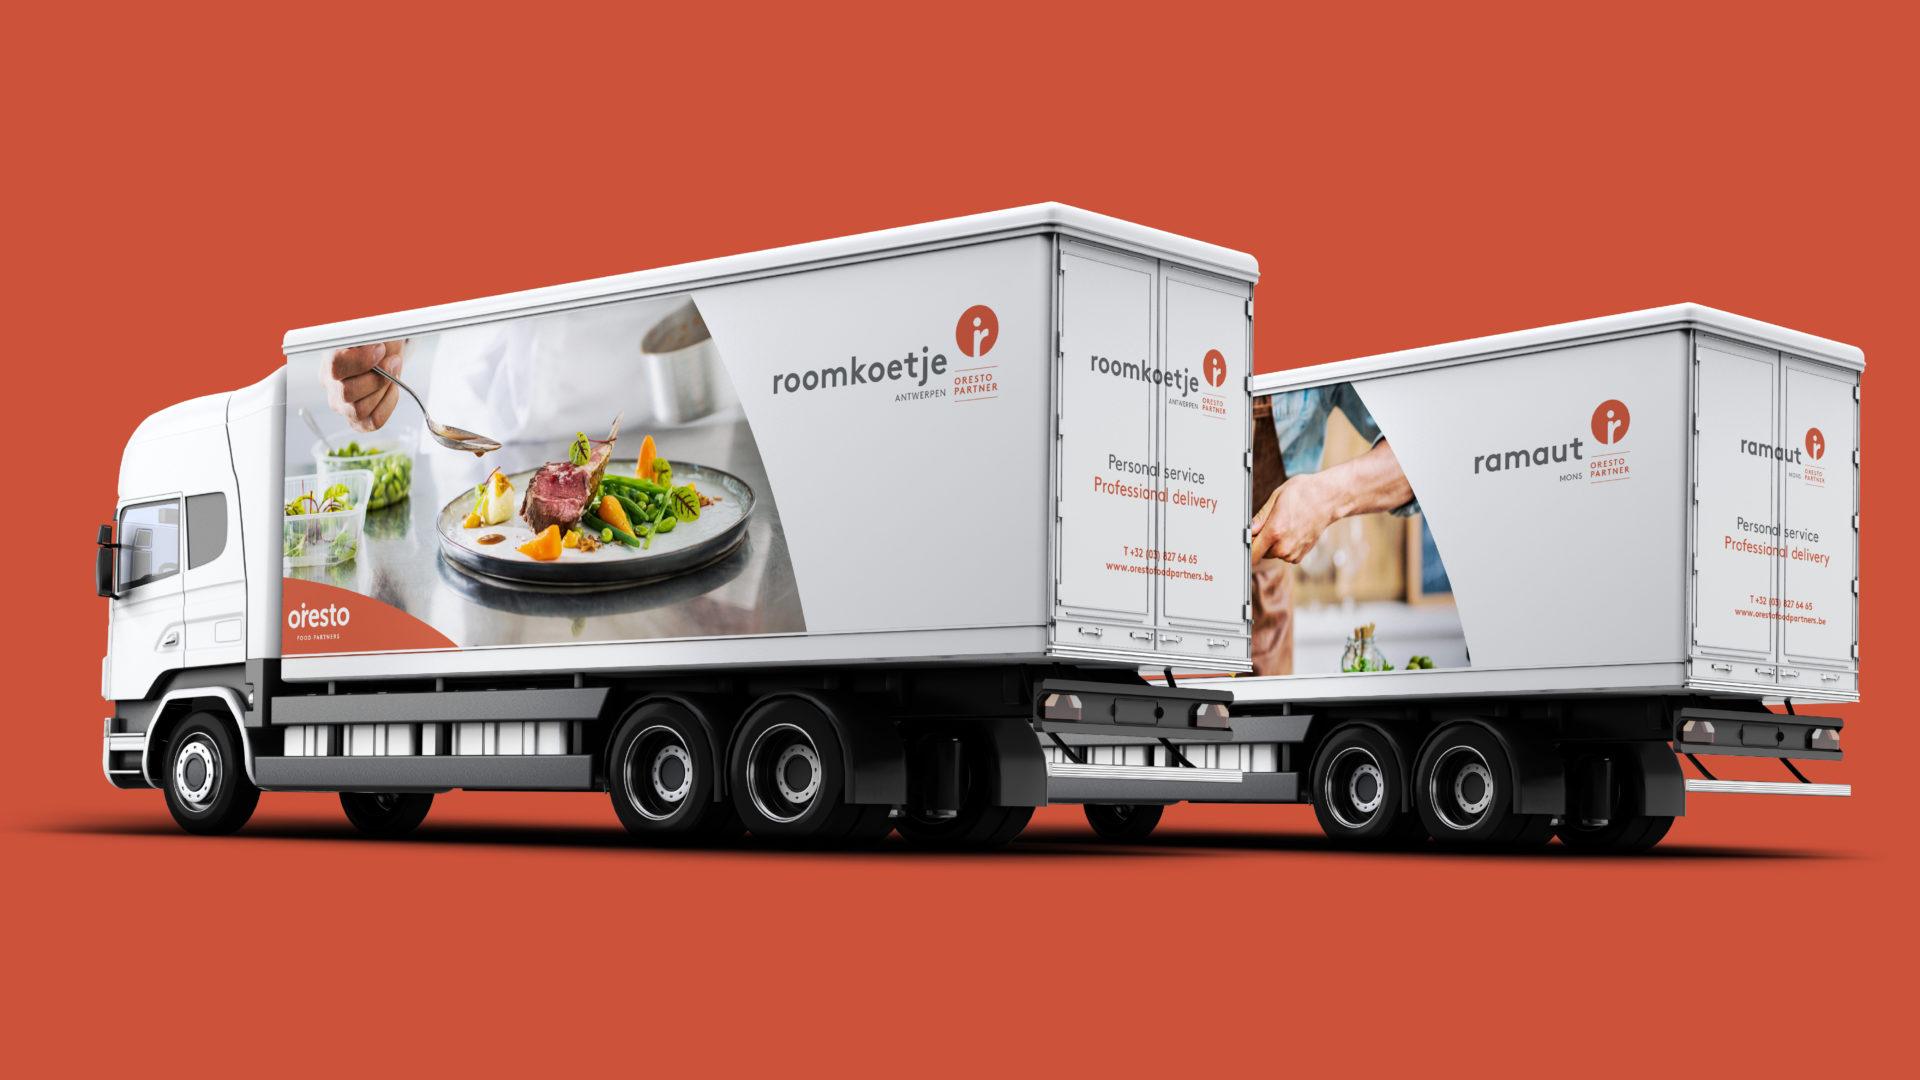 Trucks with branding of Oresto